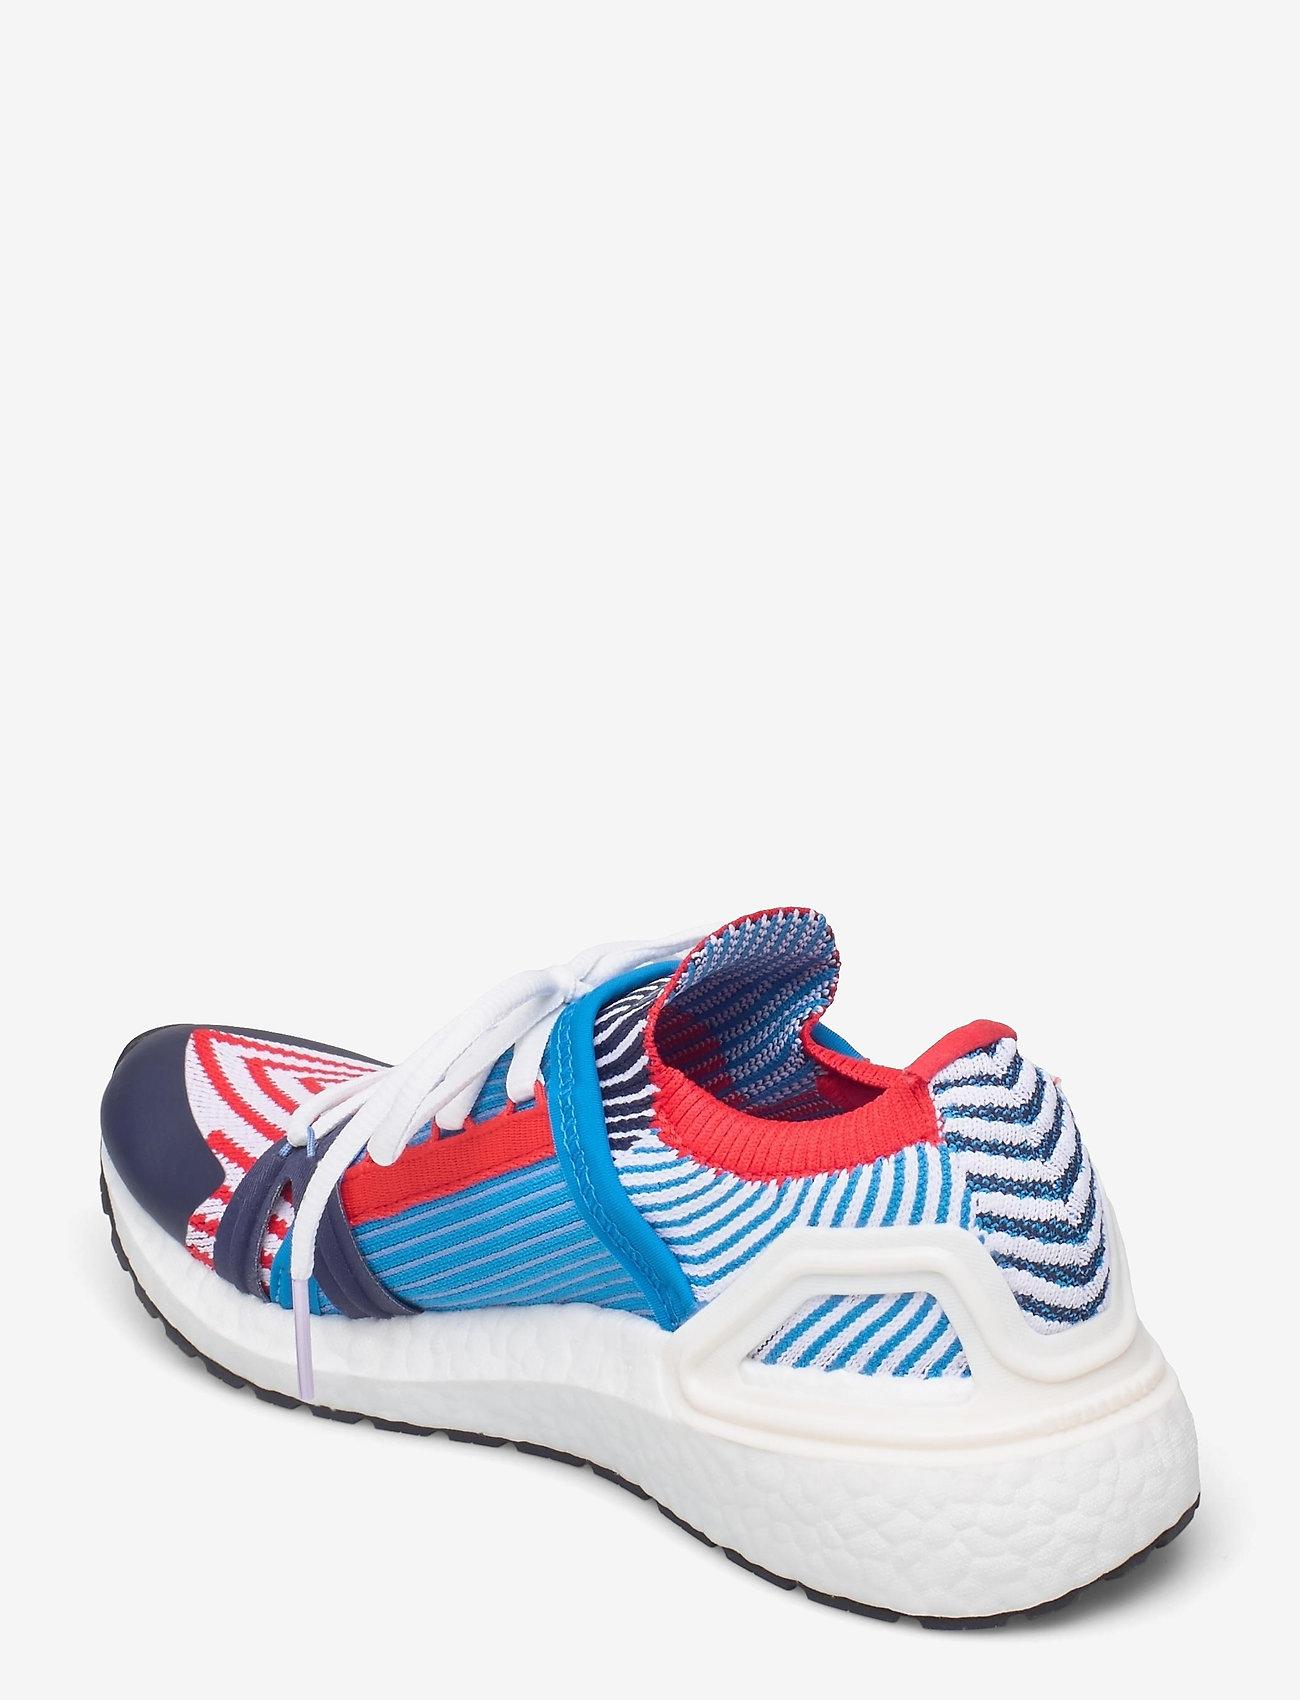 adidas by Stella McCartney - Ultraboost 20 W - running shoes - brblue/conavy/vivred - 2